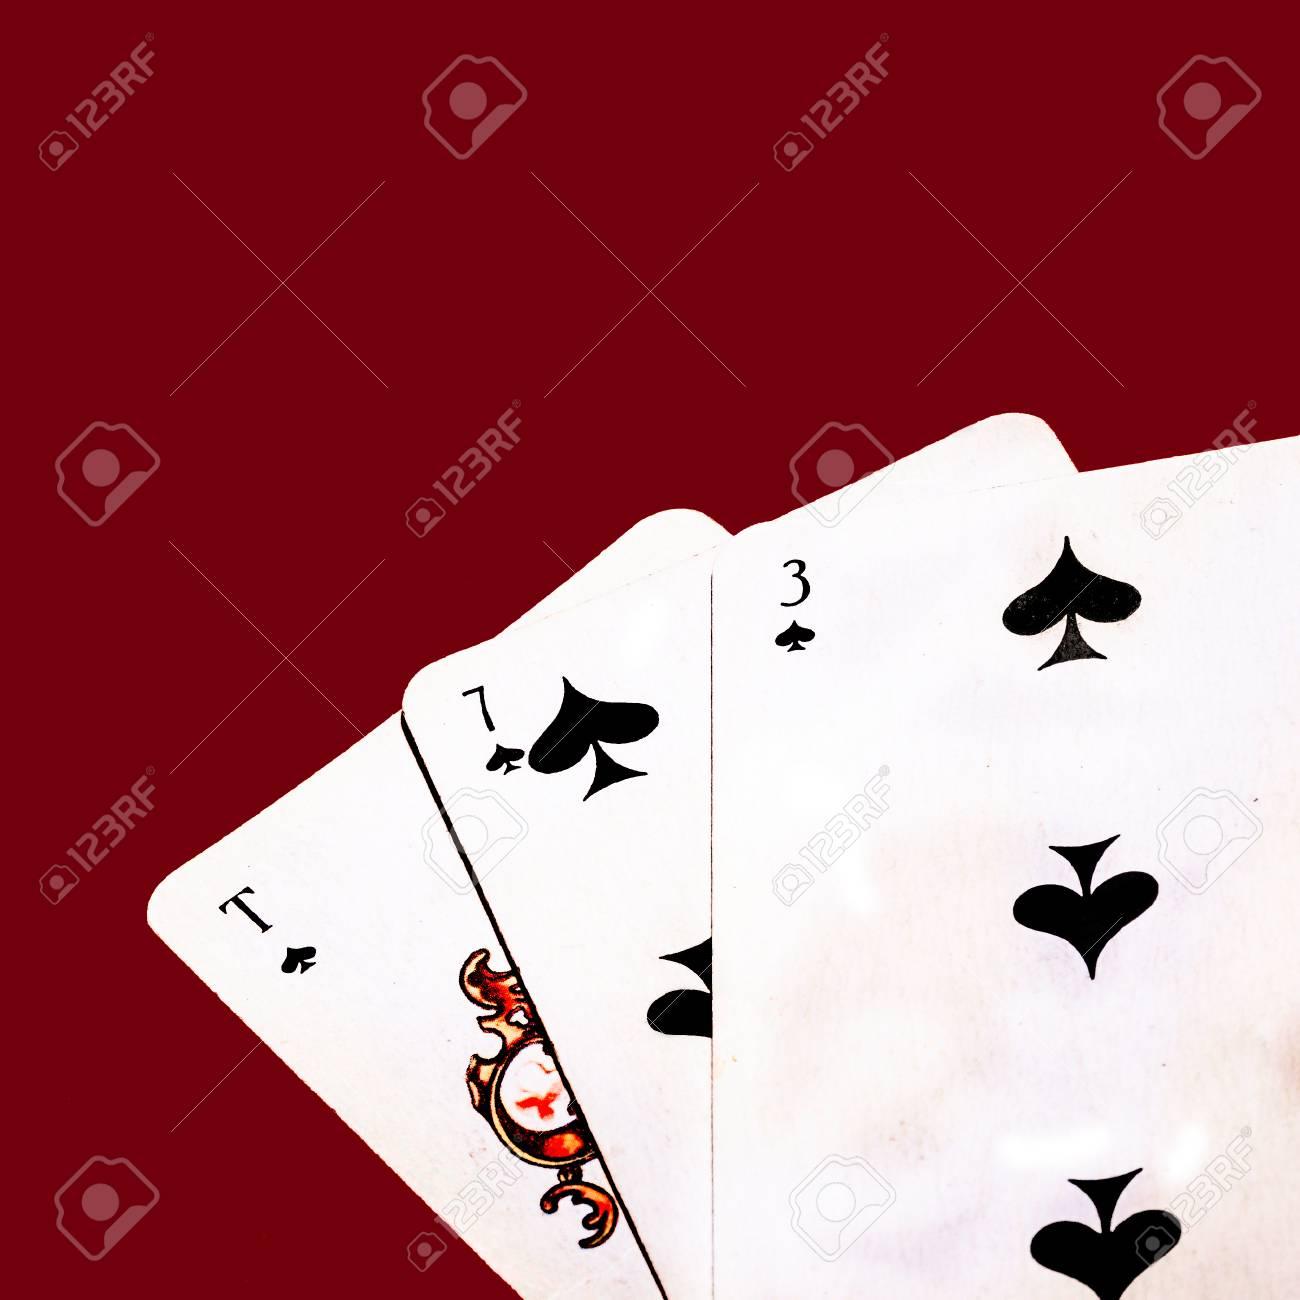 heartbroken gambling addiction